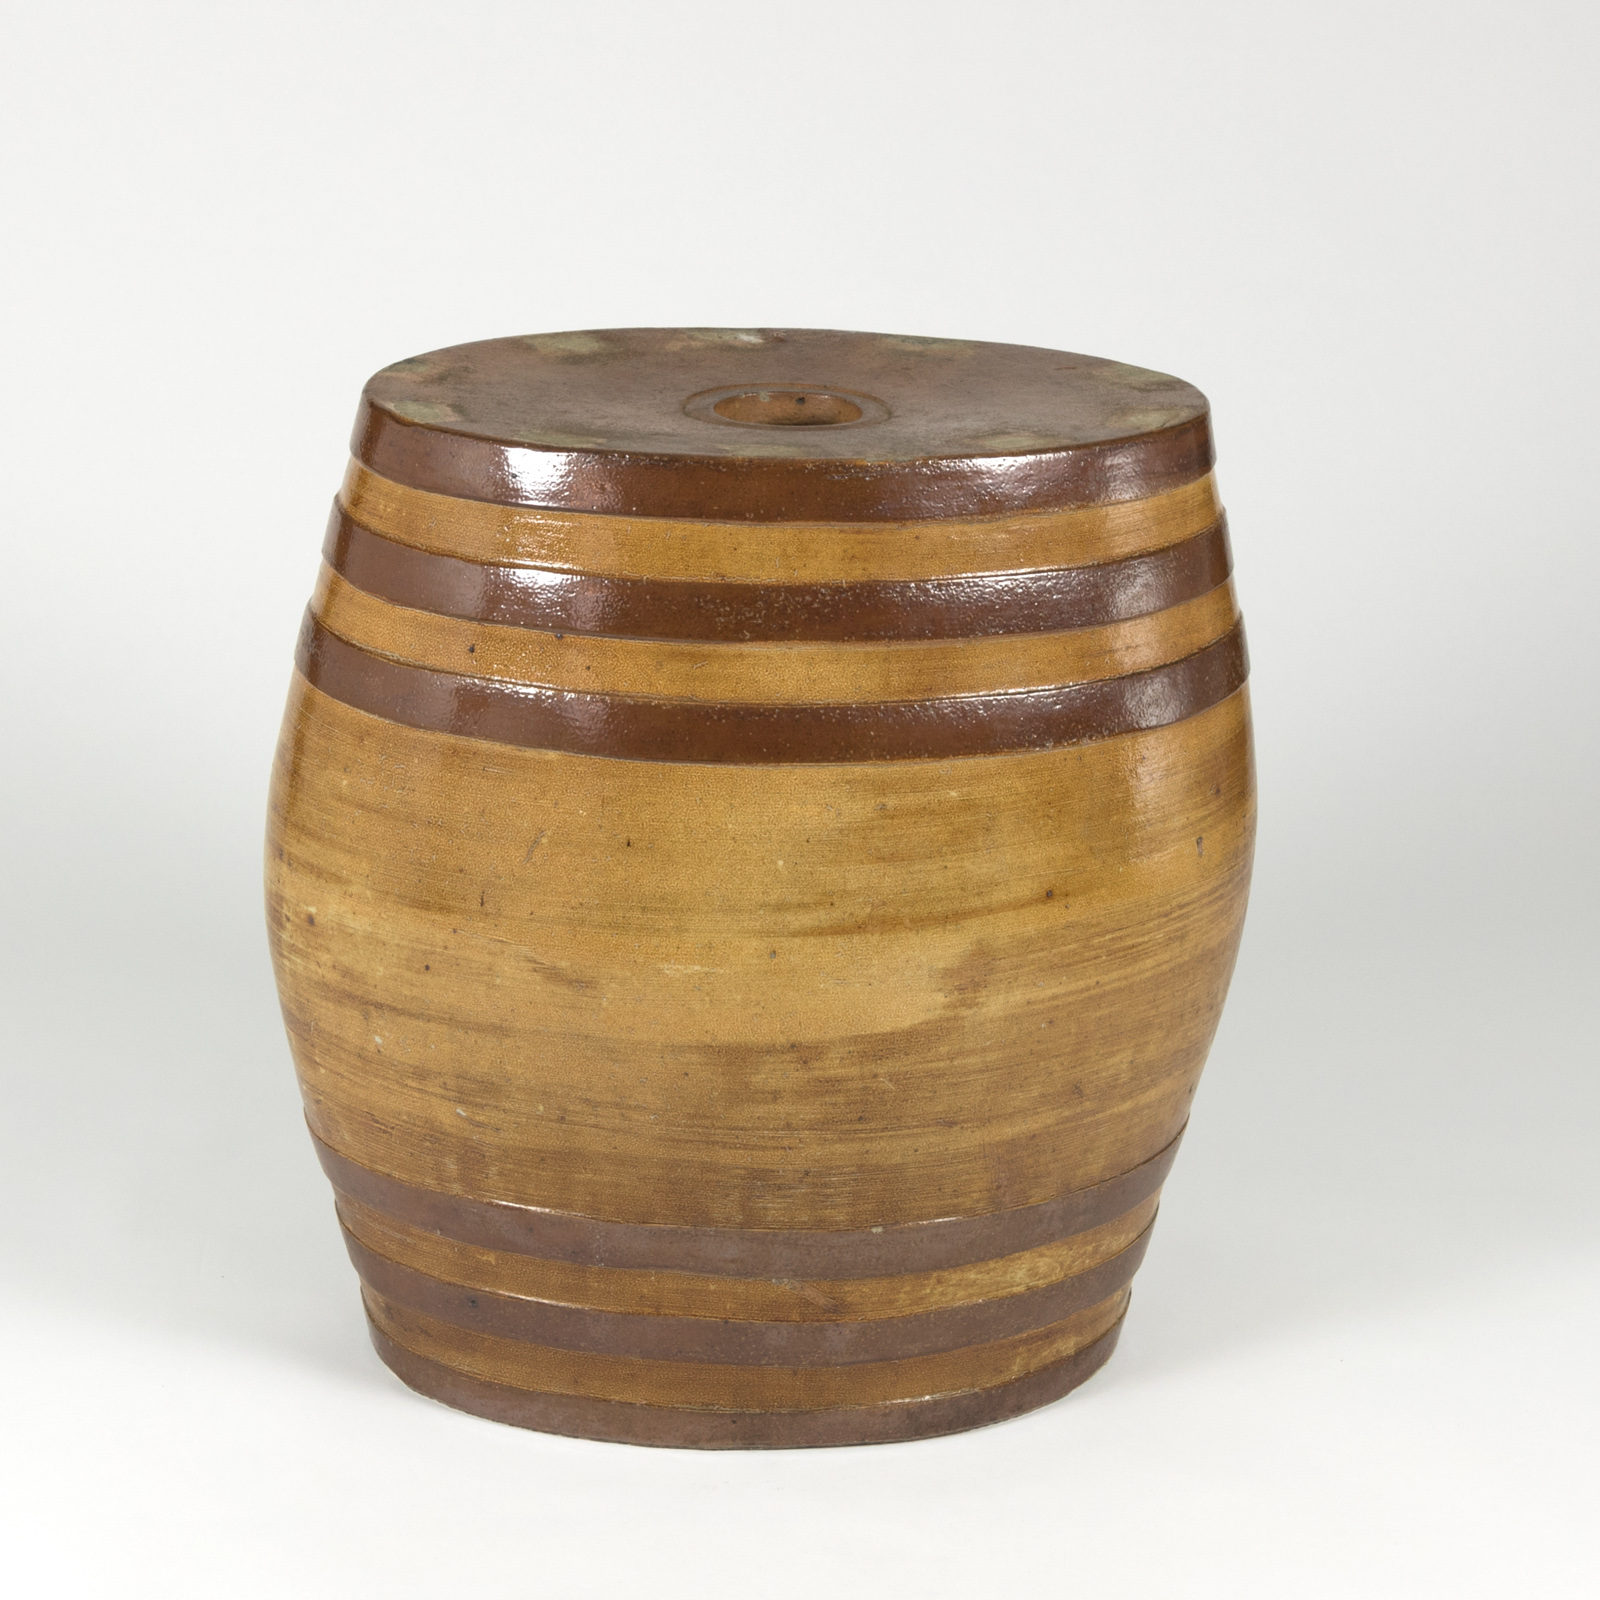 Large Treacle Salt Glaze Spirit Barrel, Doulton, Lambeth (415) 355-1690